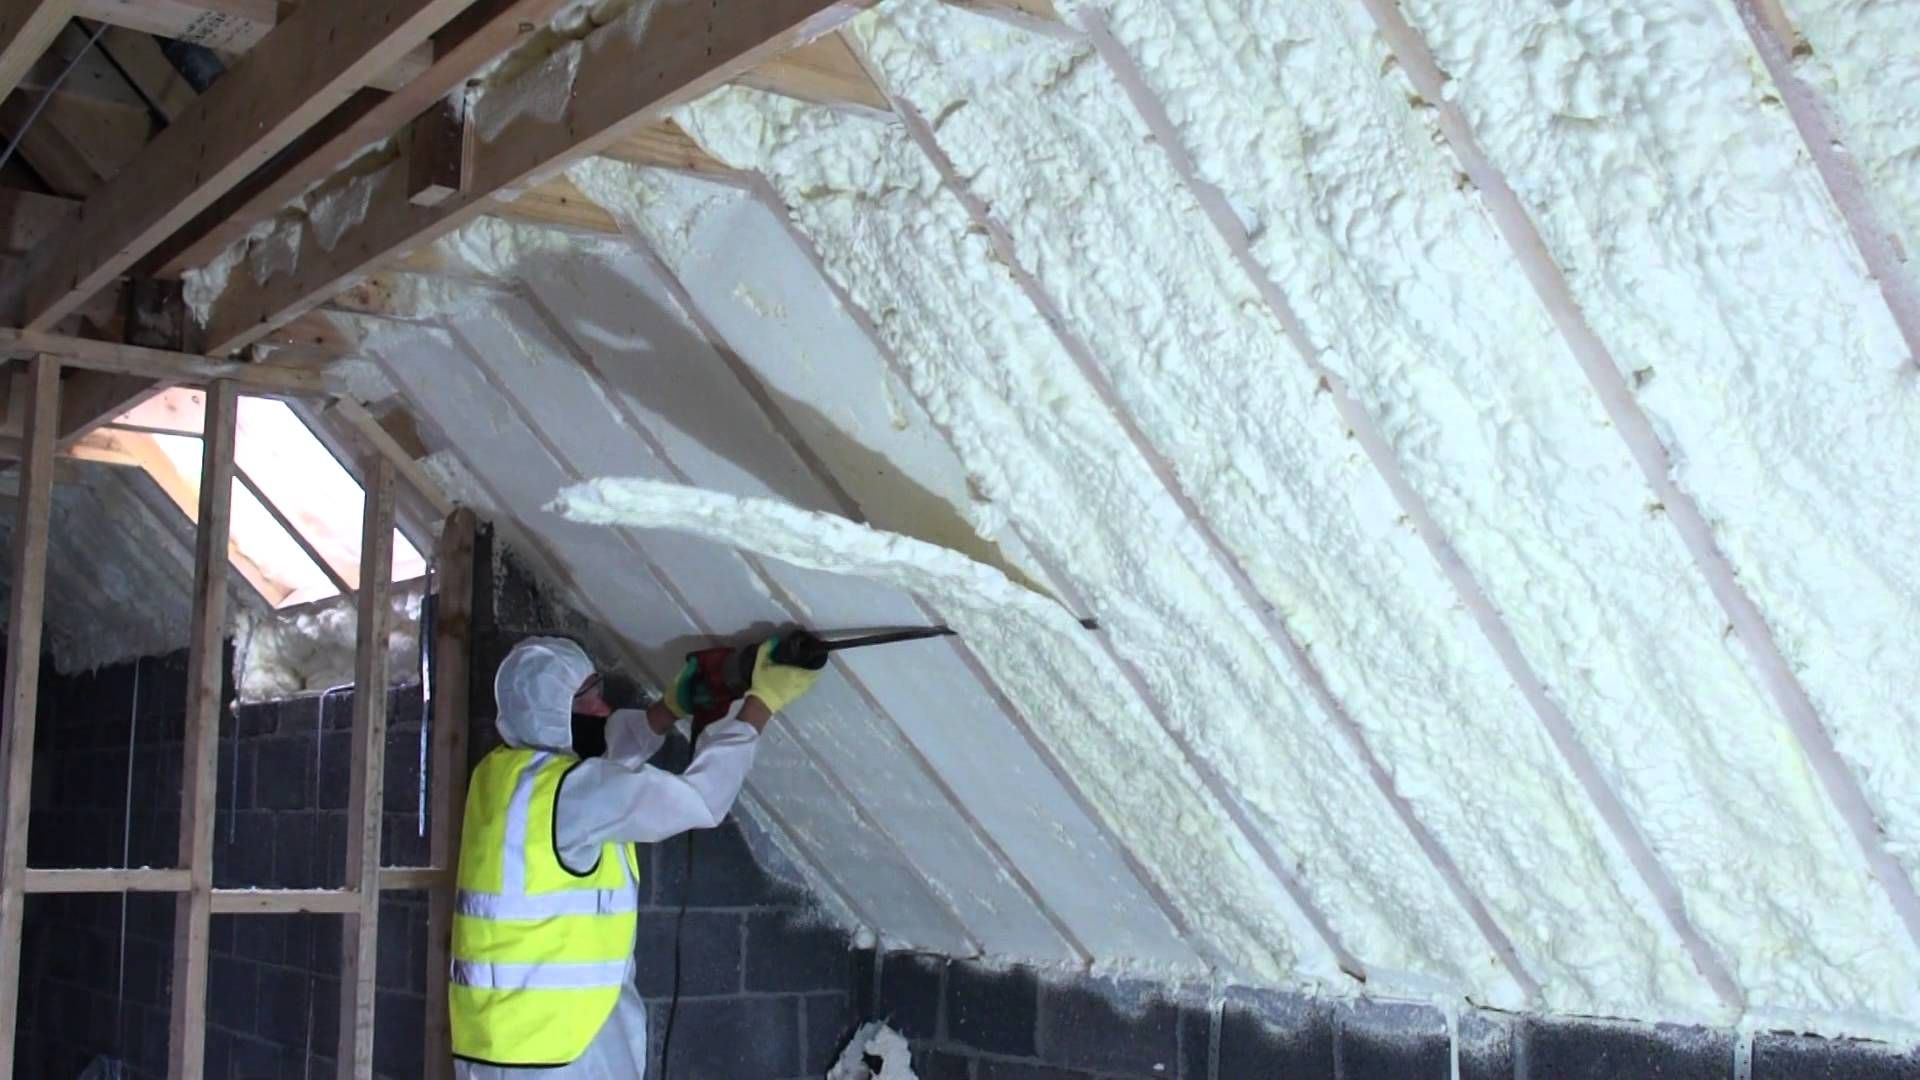 Spray foam of attic using fusion sprayfoam insulation being cut spray foam of attic using fusion sprayfoam insulation being cut flush ww solutioingenieria Images